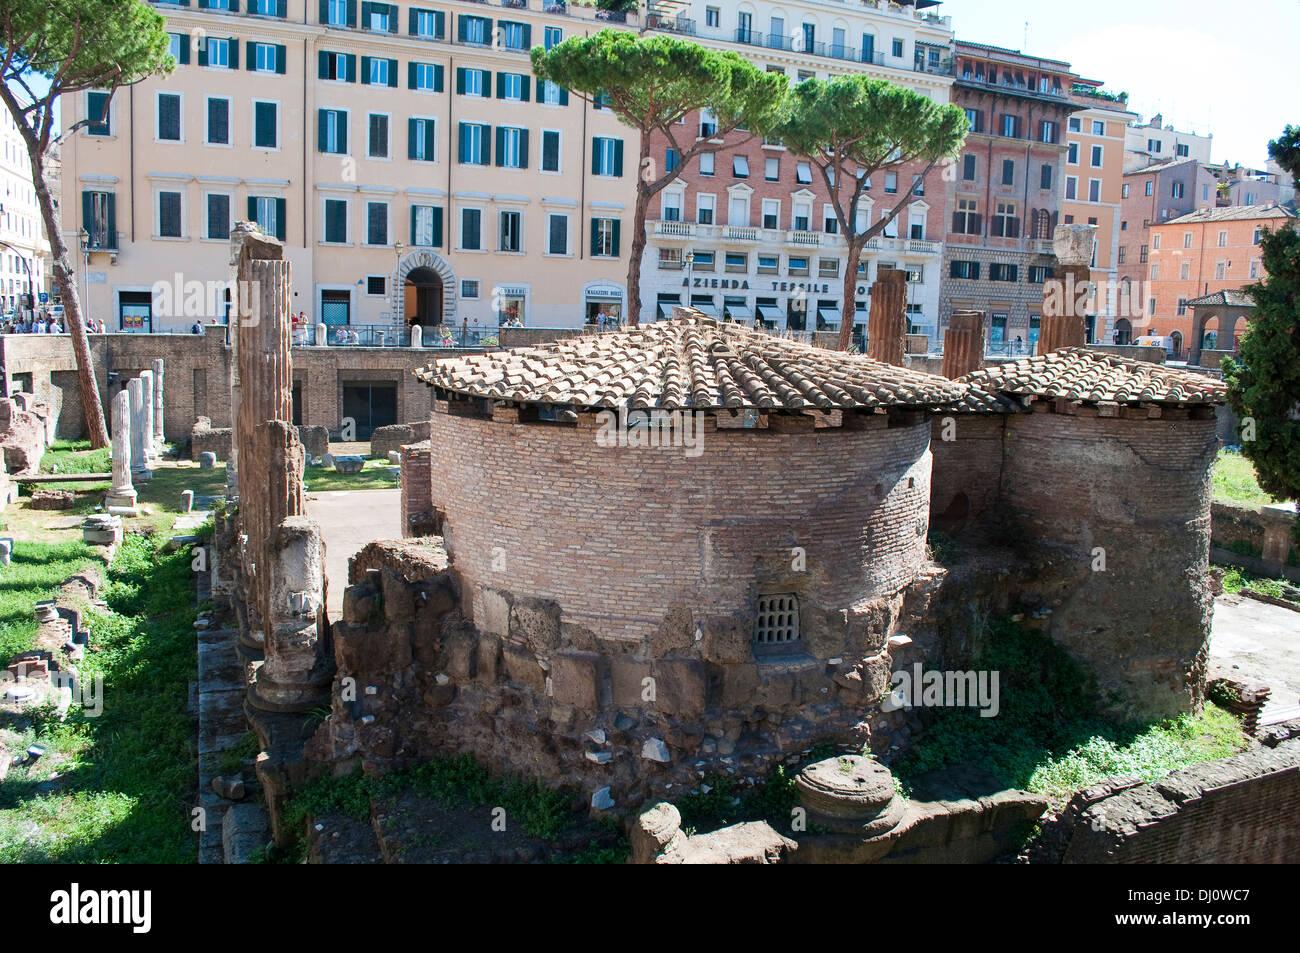 Remains of Republican Roman temples and Pompey's Theatre, Largo di Torre Argentina, Campus Martius, Rome, Italy - Stock Image